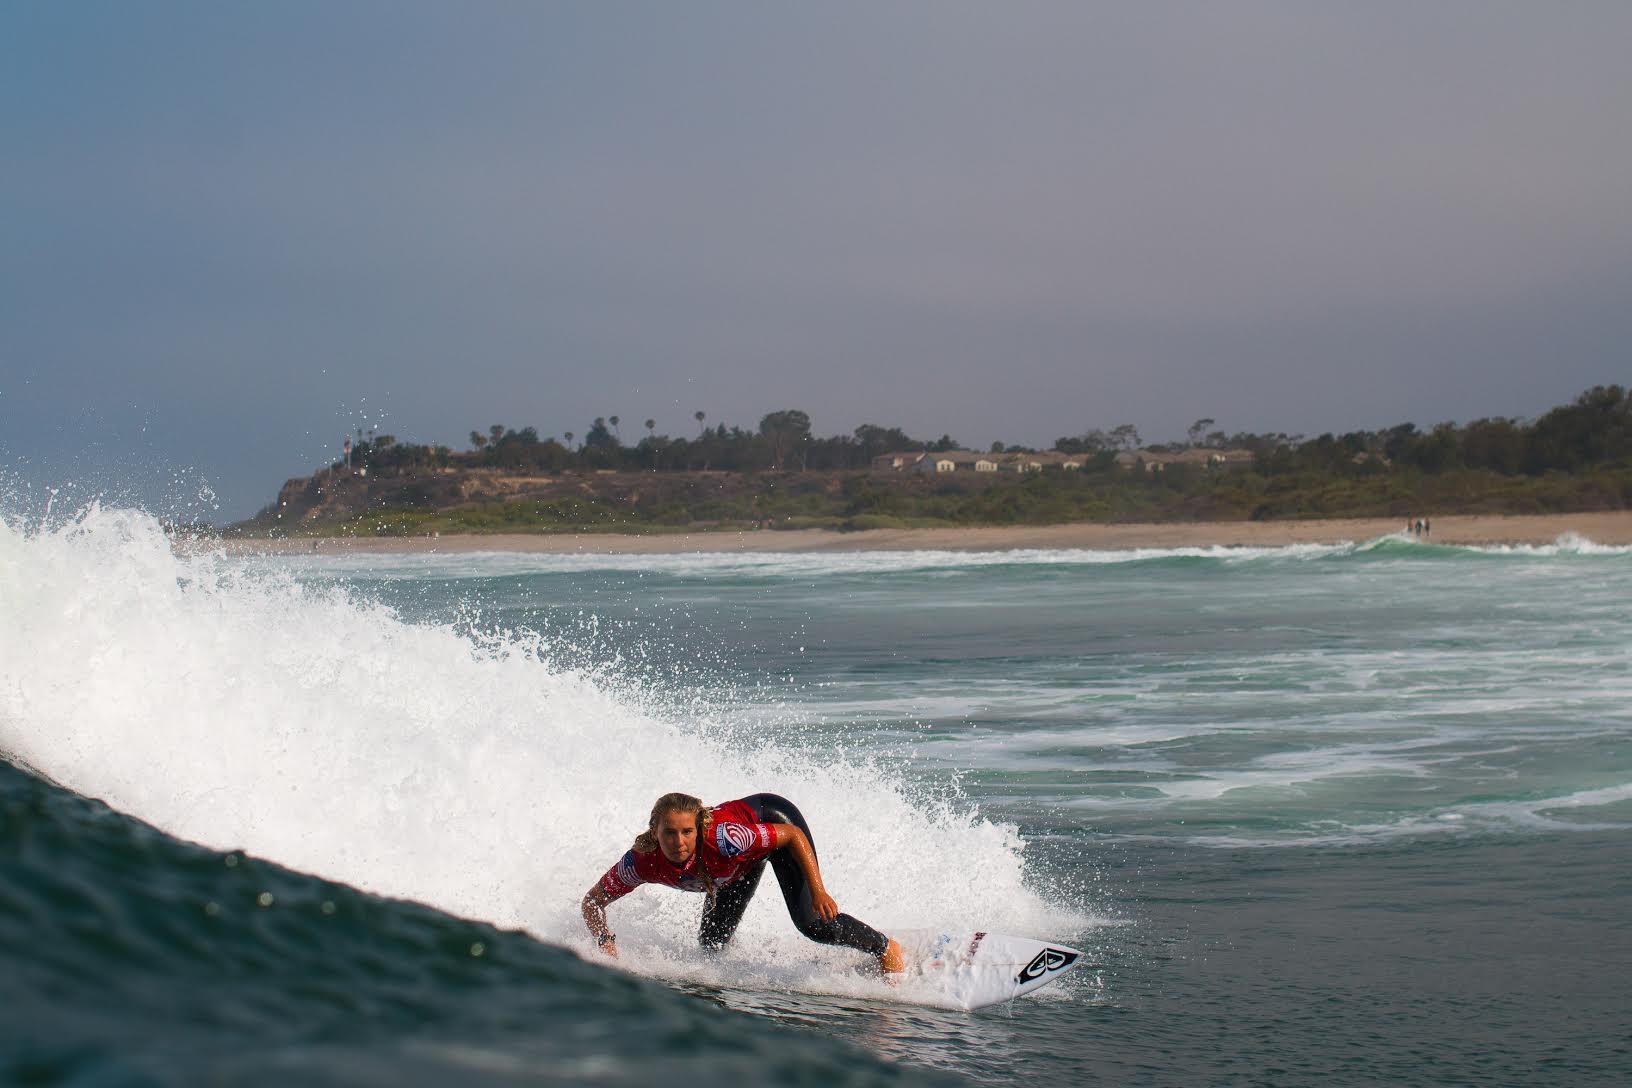 Summer drives off the bottom Photo: Nate Harrington